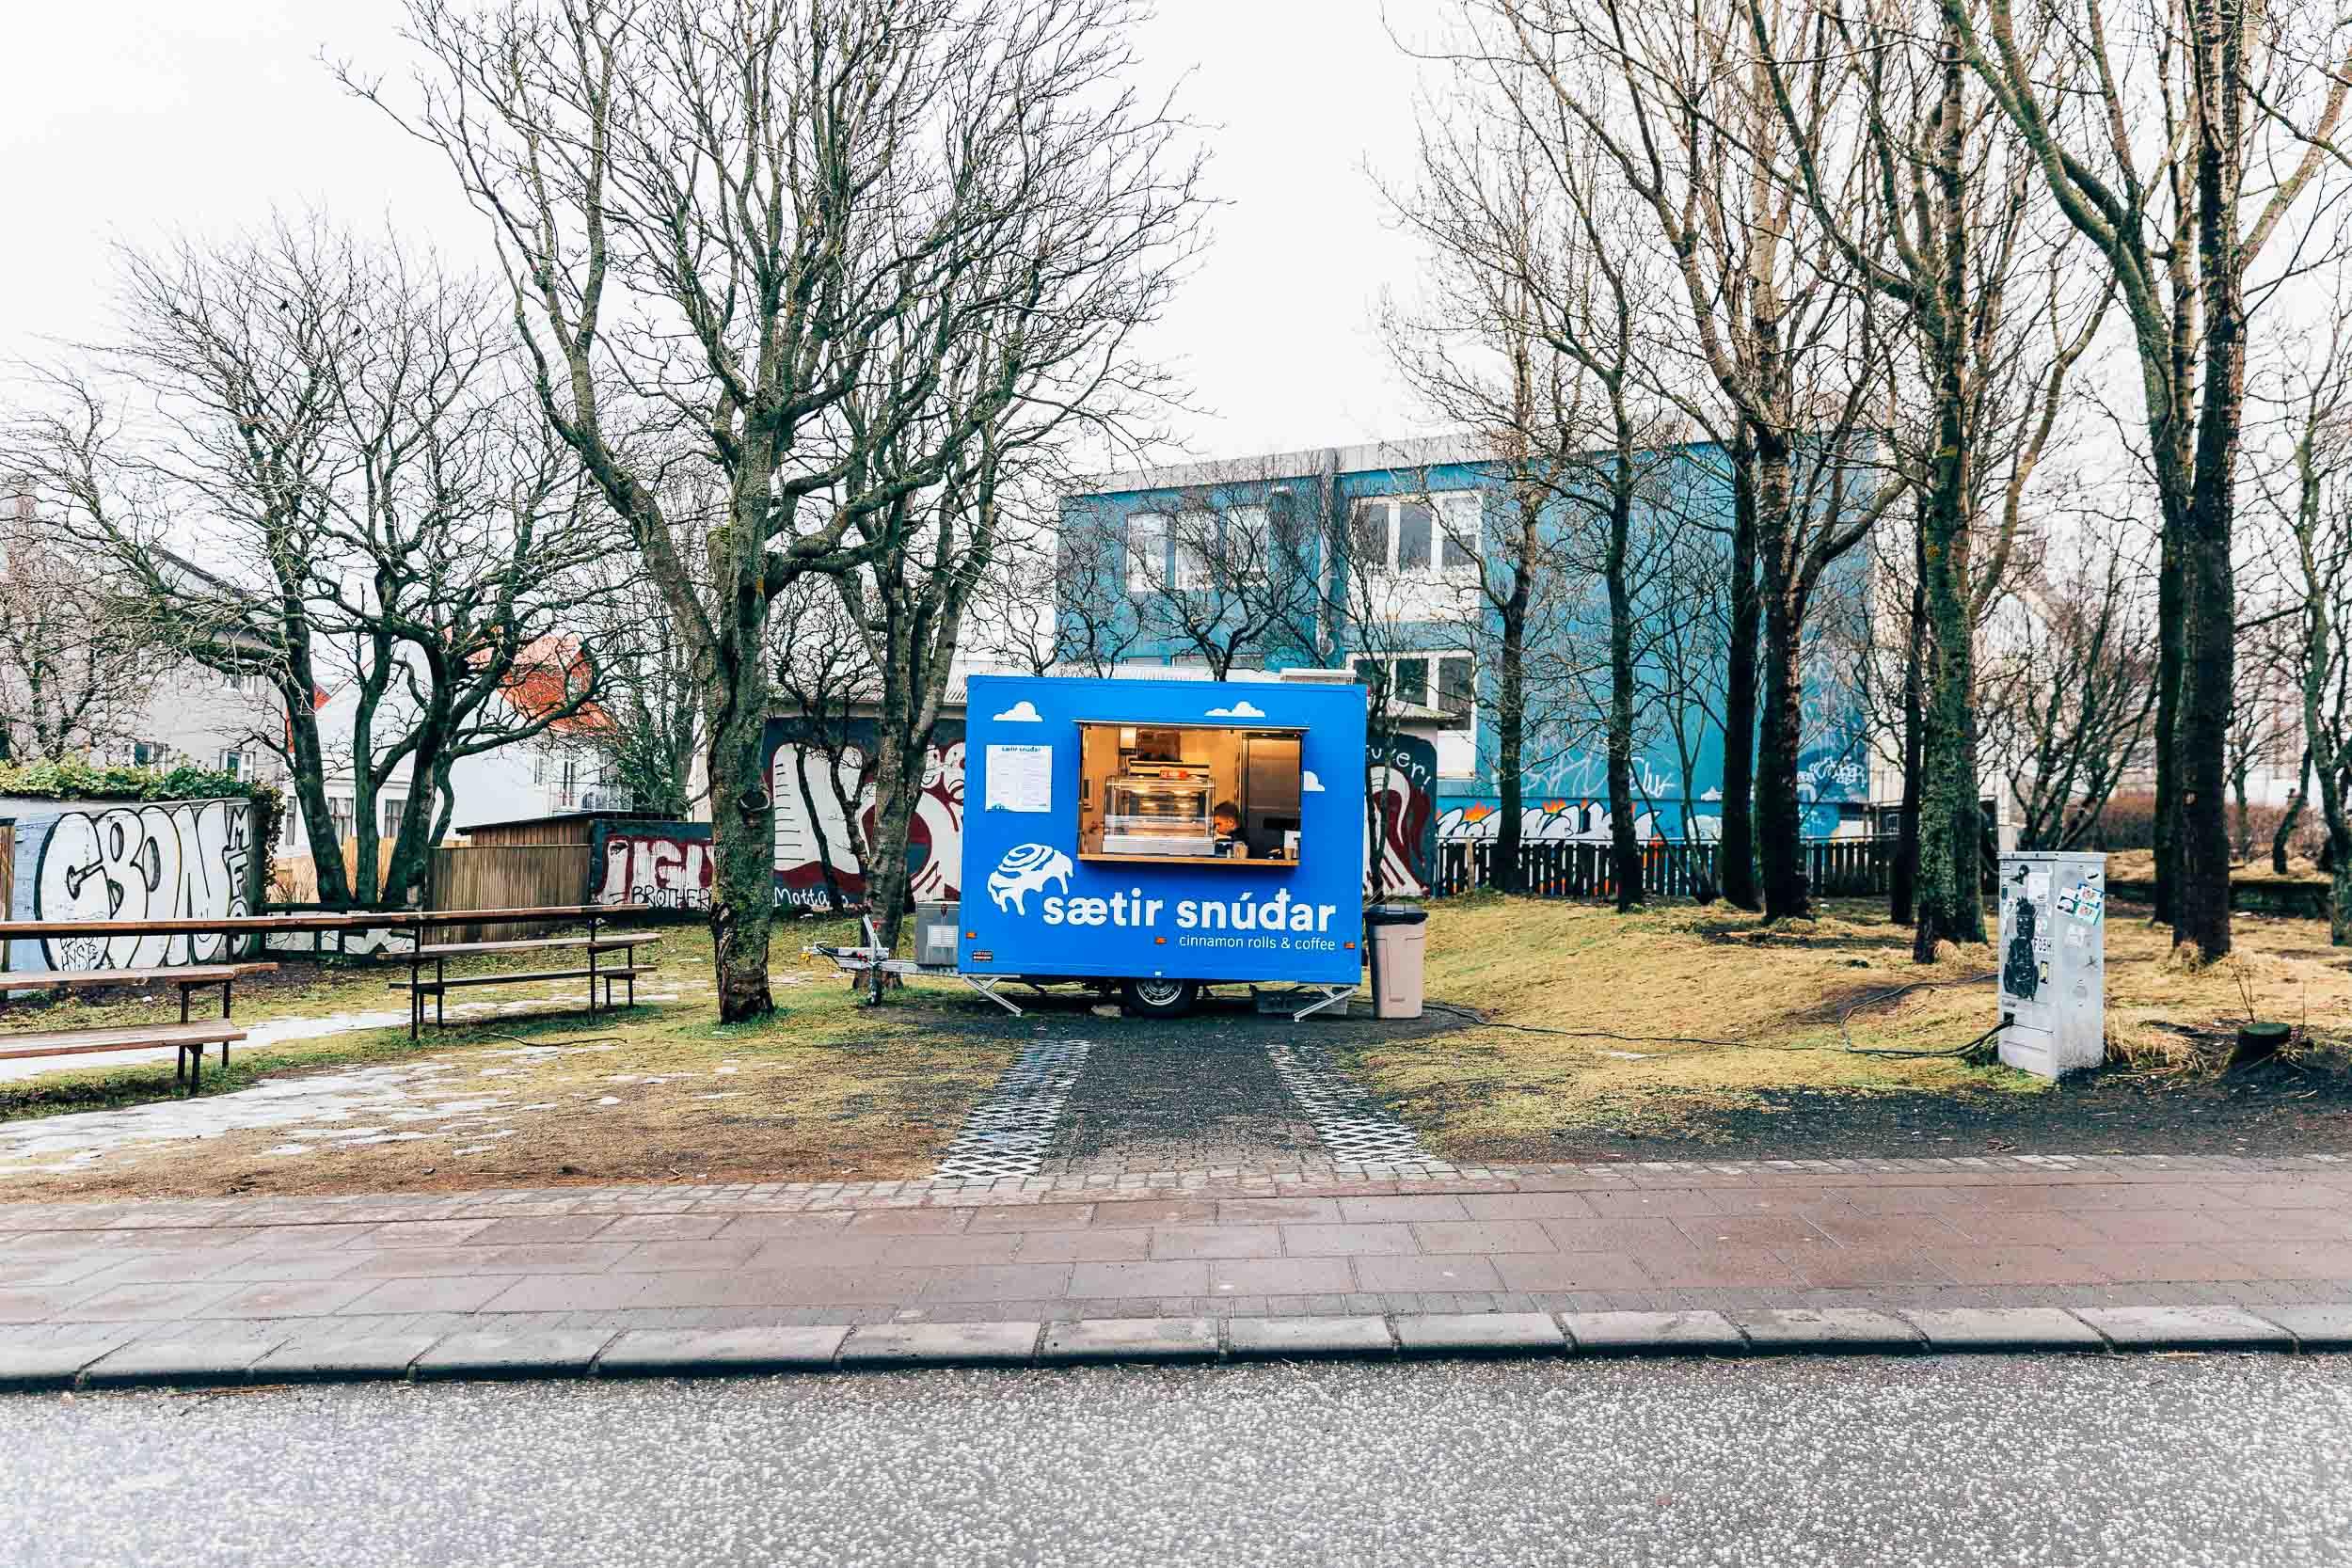 02_2019_Iceland-85.jpg